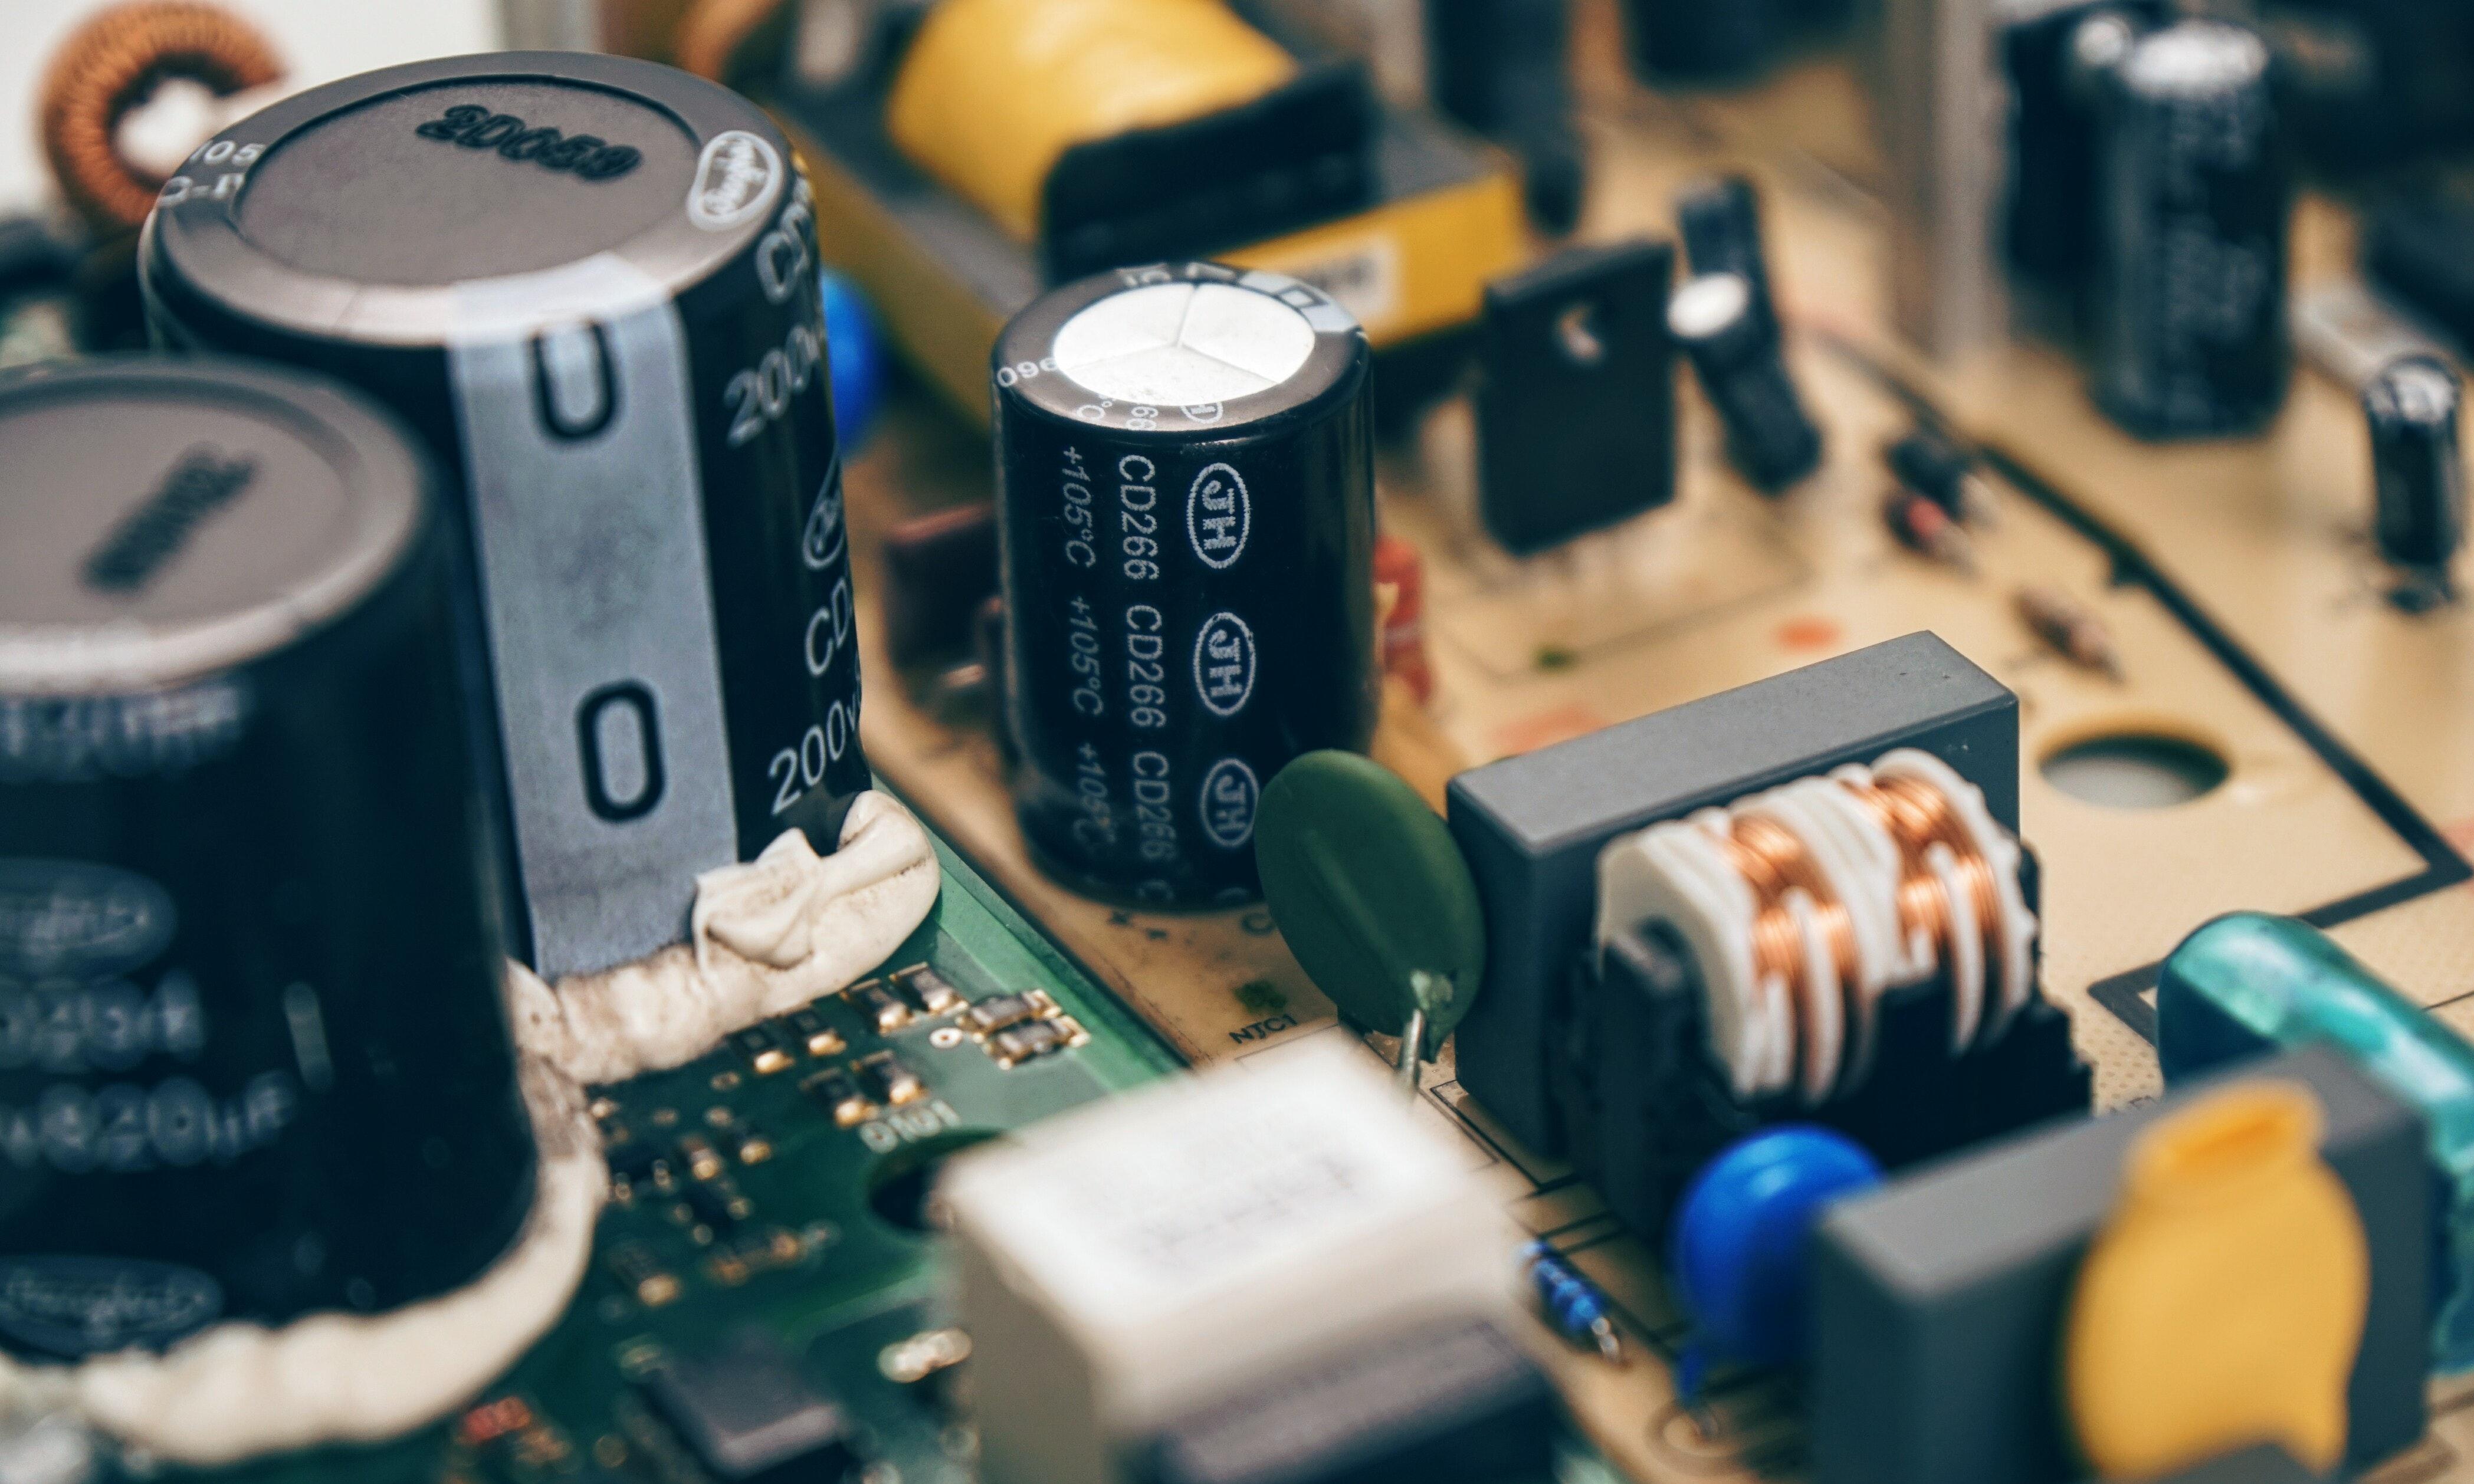 Black Computer Compenent, Blur, Electronics, Technology, Power, HQ Photo